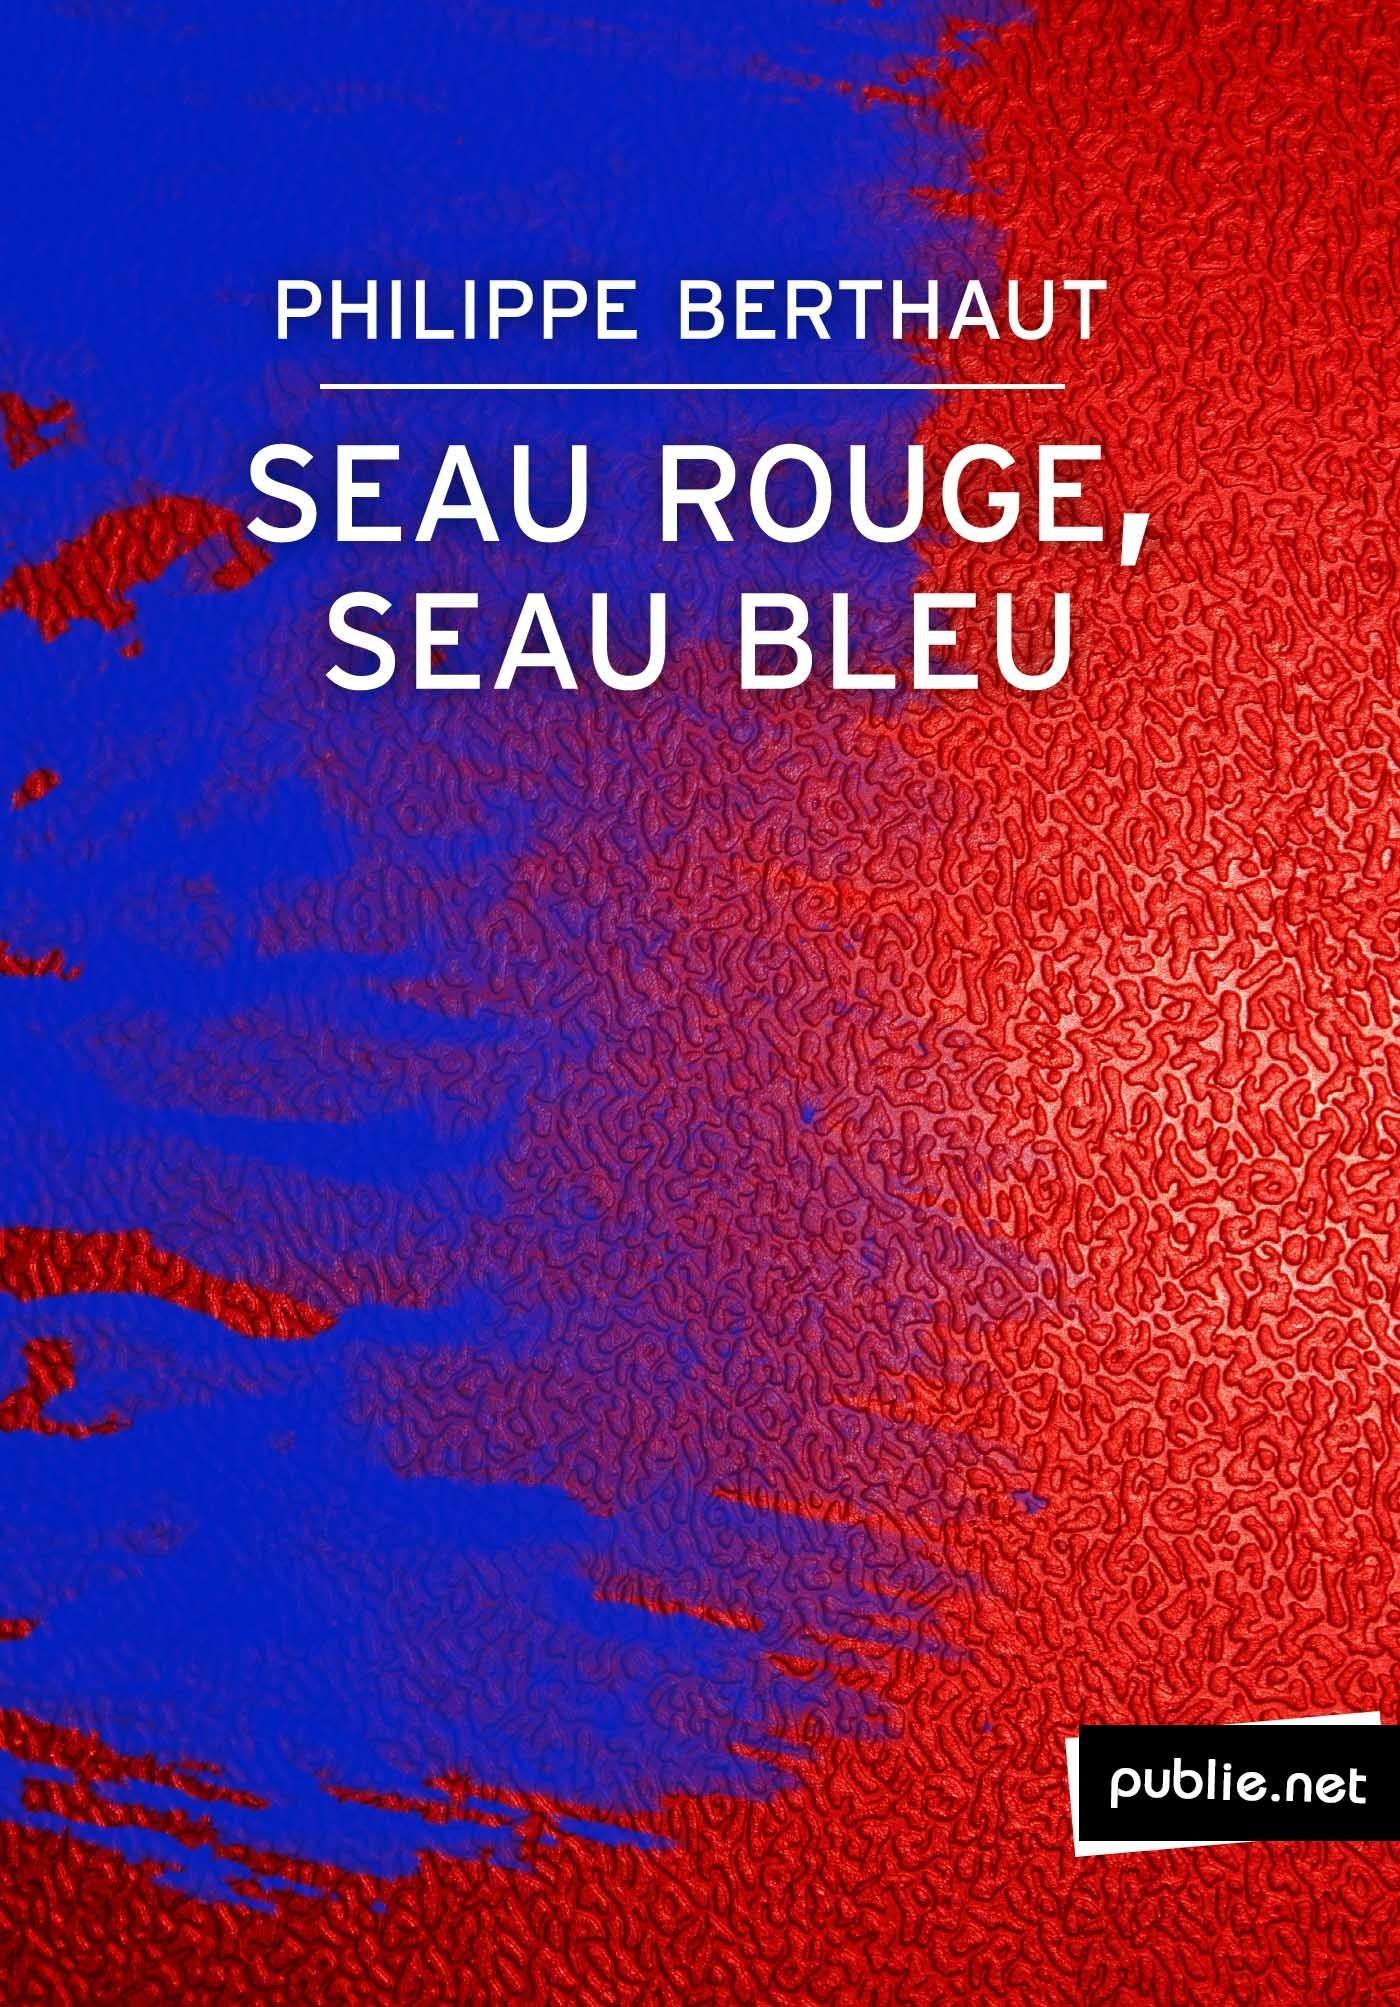 seau rouge, seau bleu